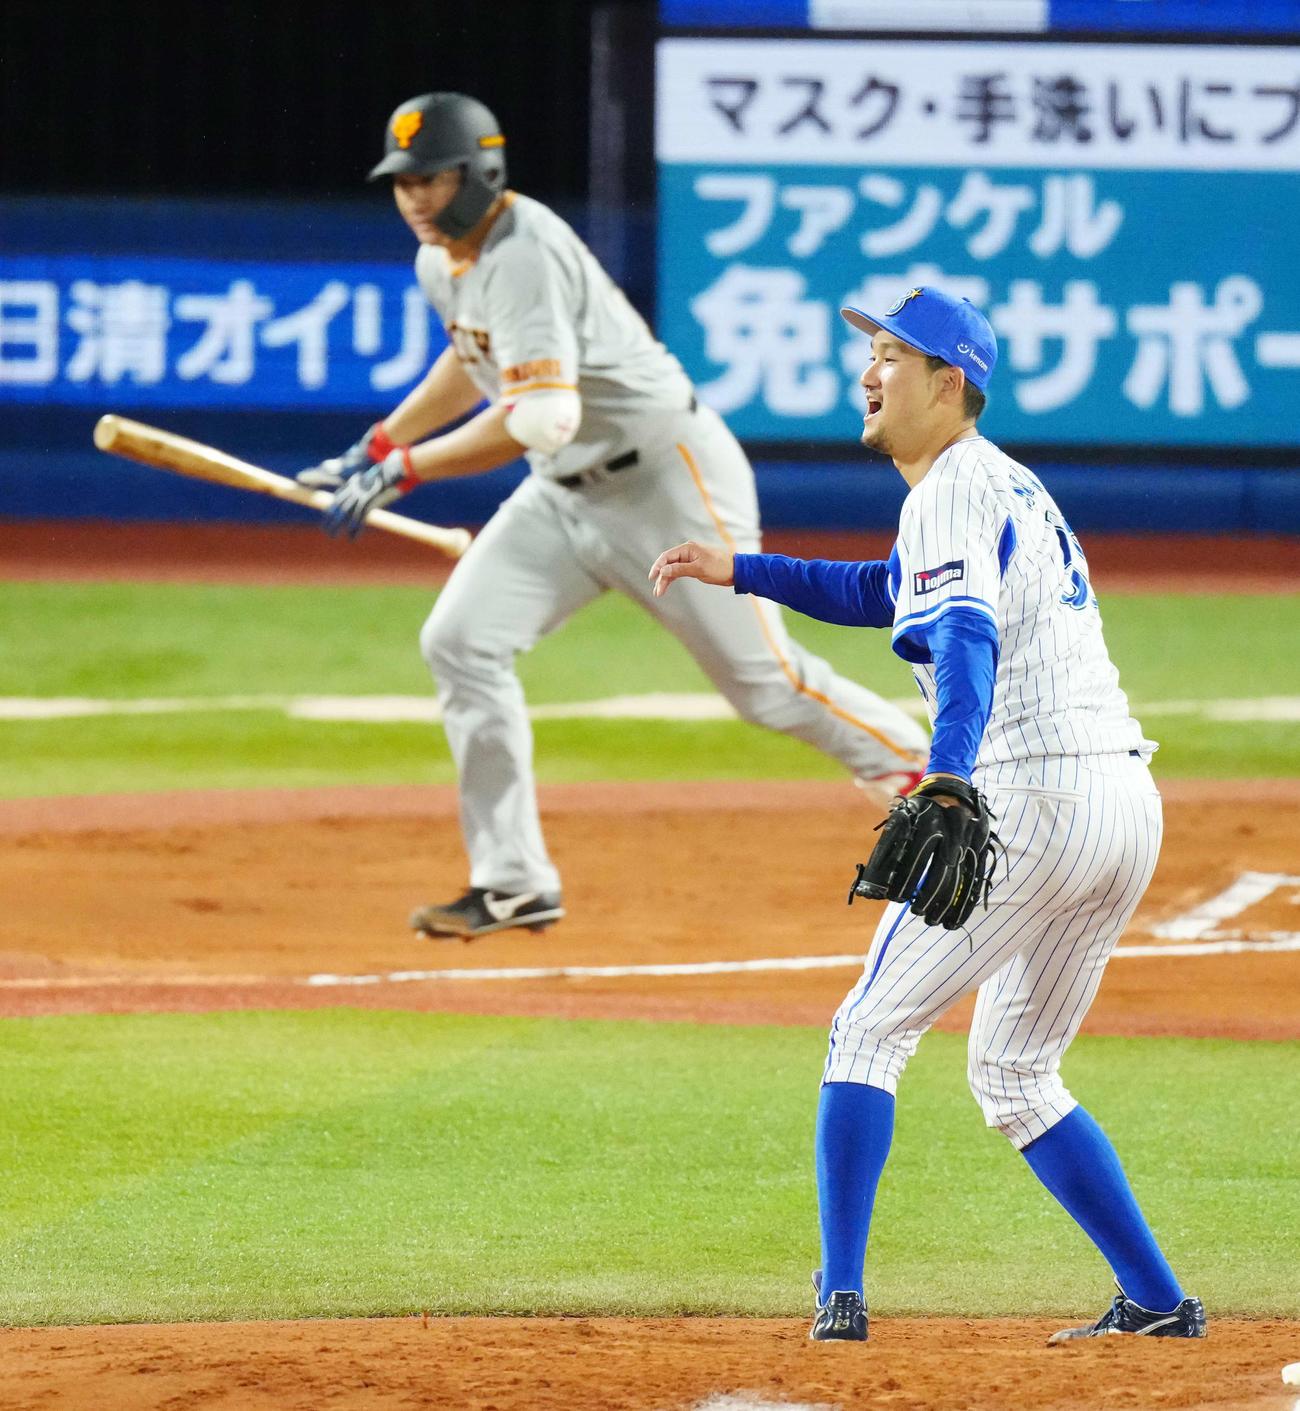 DeNA対巨人 6回表巨人1死、投手強襲内野安打となった菅野(左)の打球が直撃した三上(撮影・江口和貴)